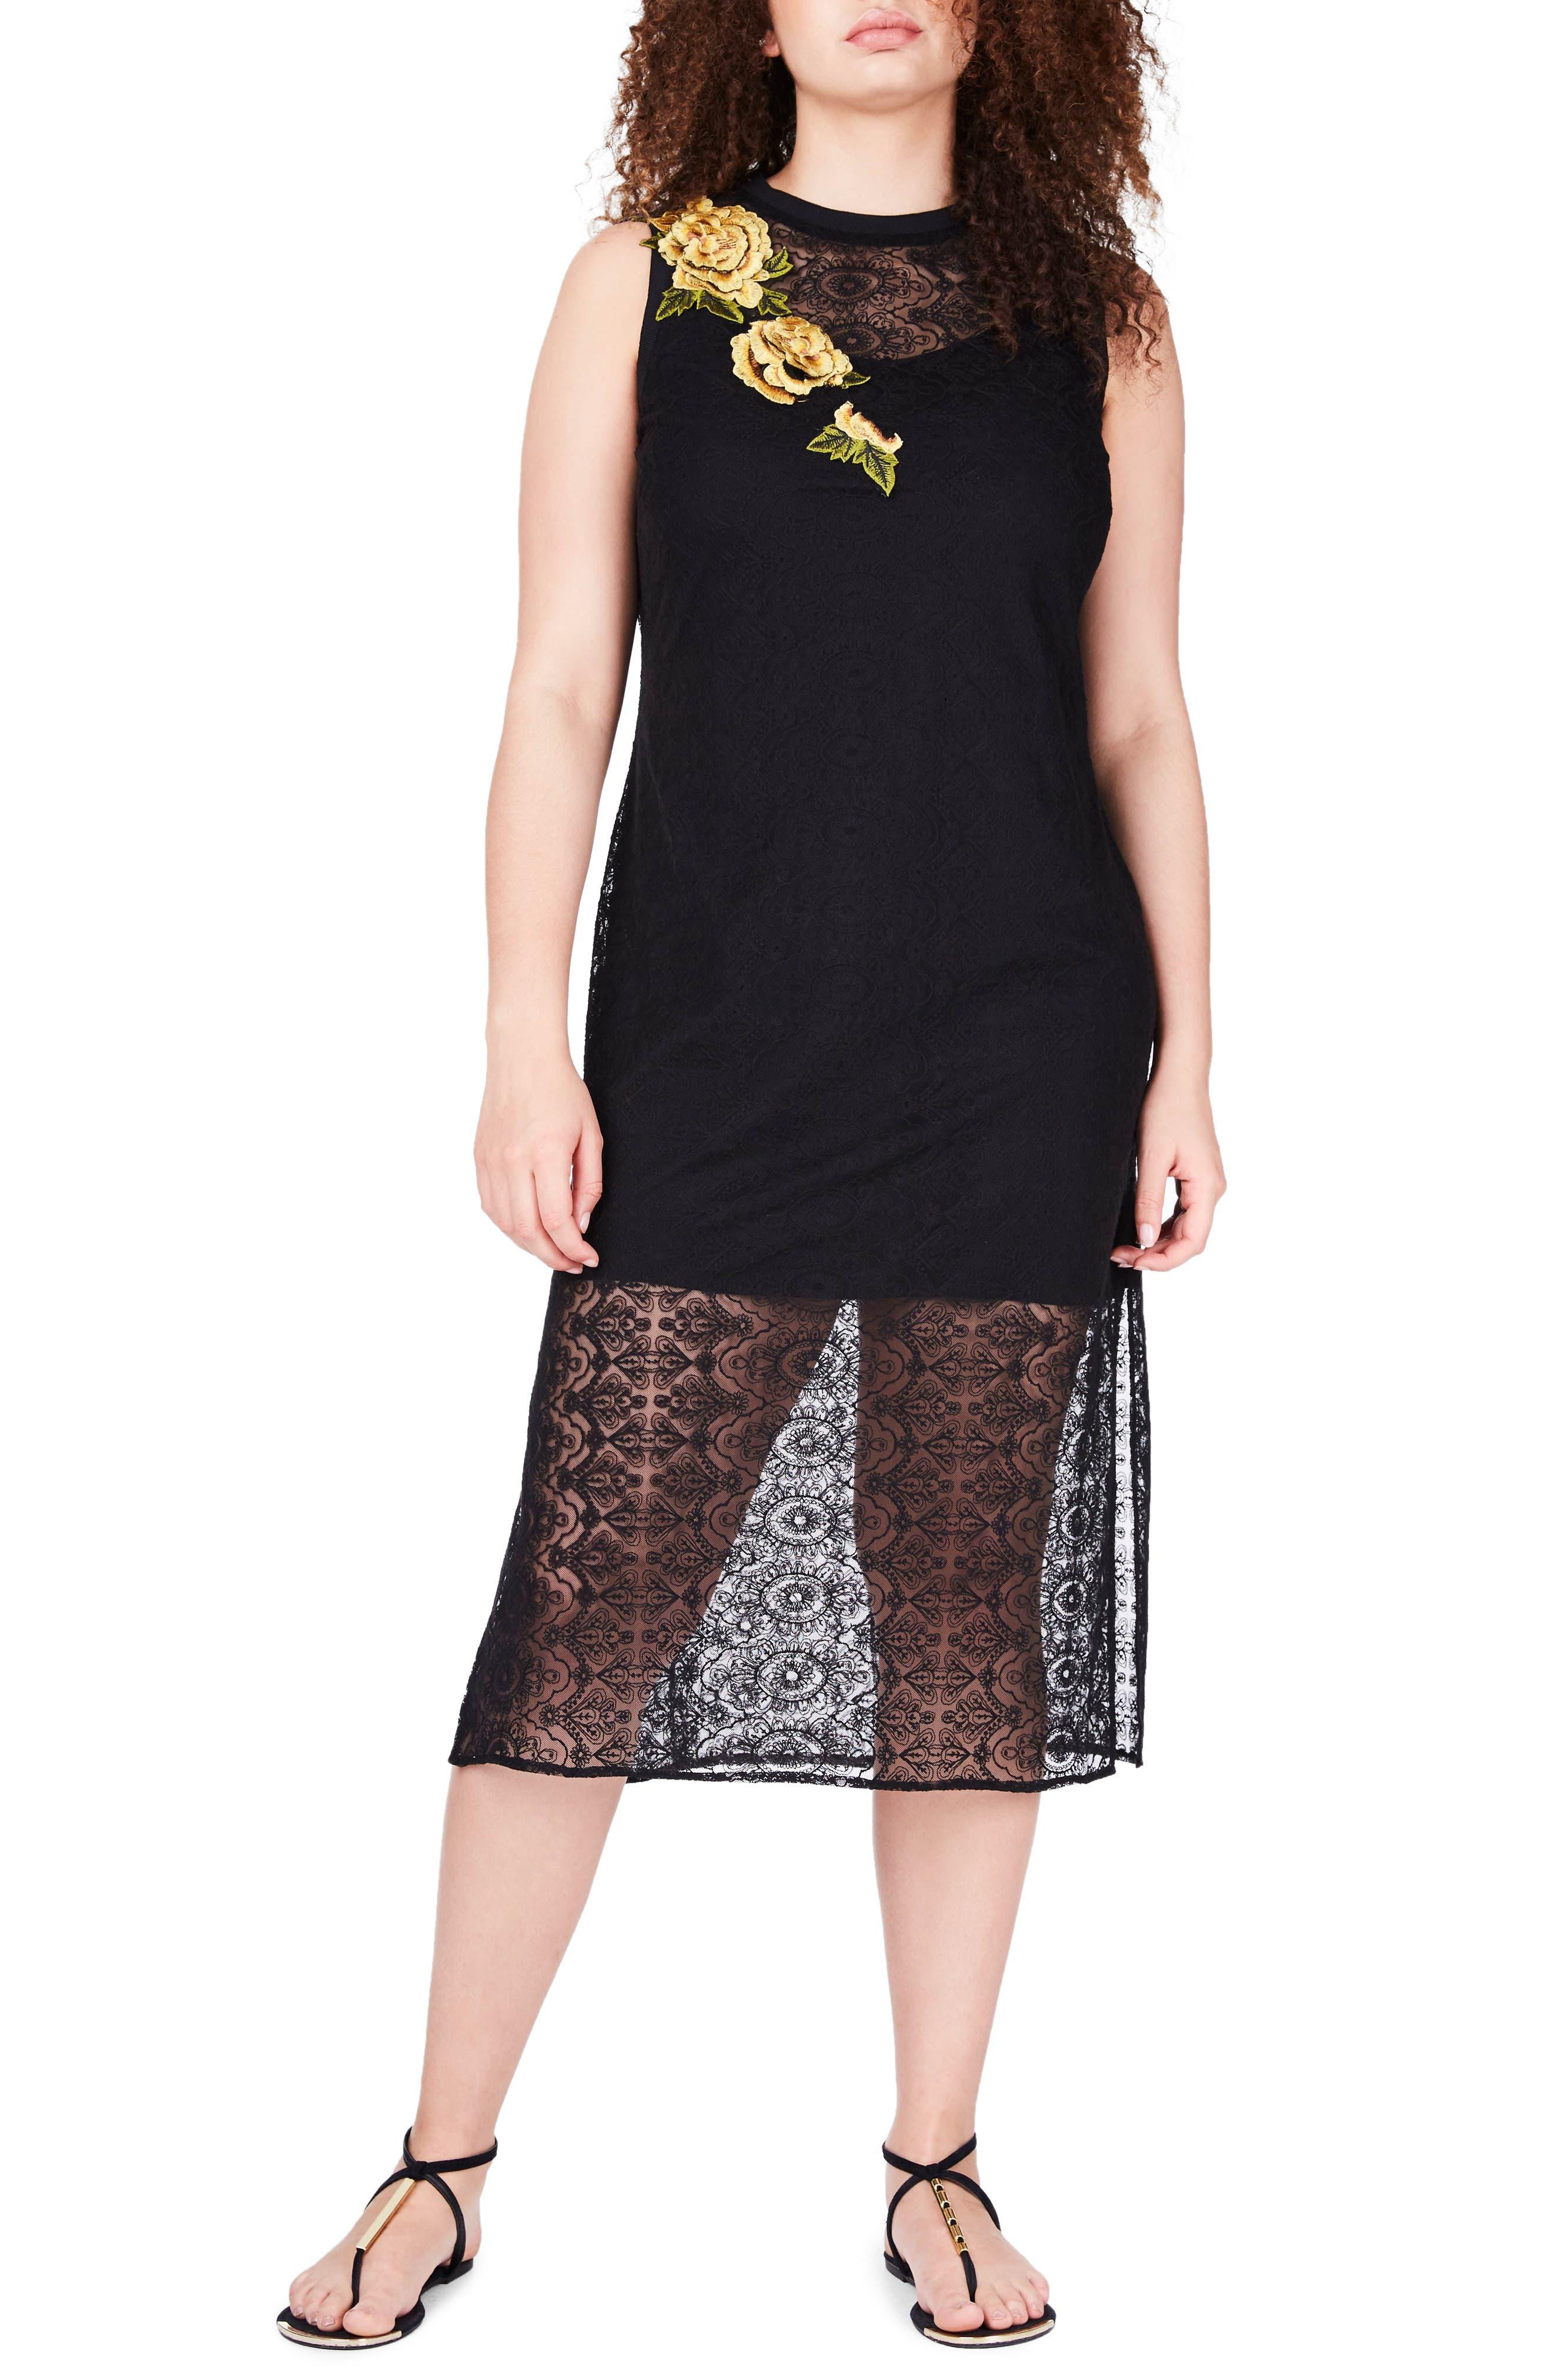 Alternate Image 1 Selected - ELVI Embroidered Lace Tunic Dress (Plus Size)